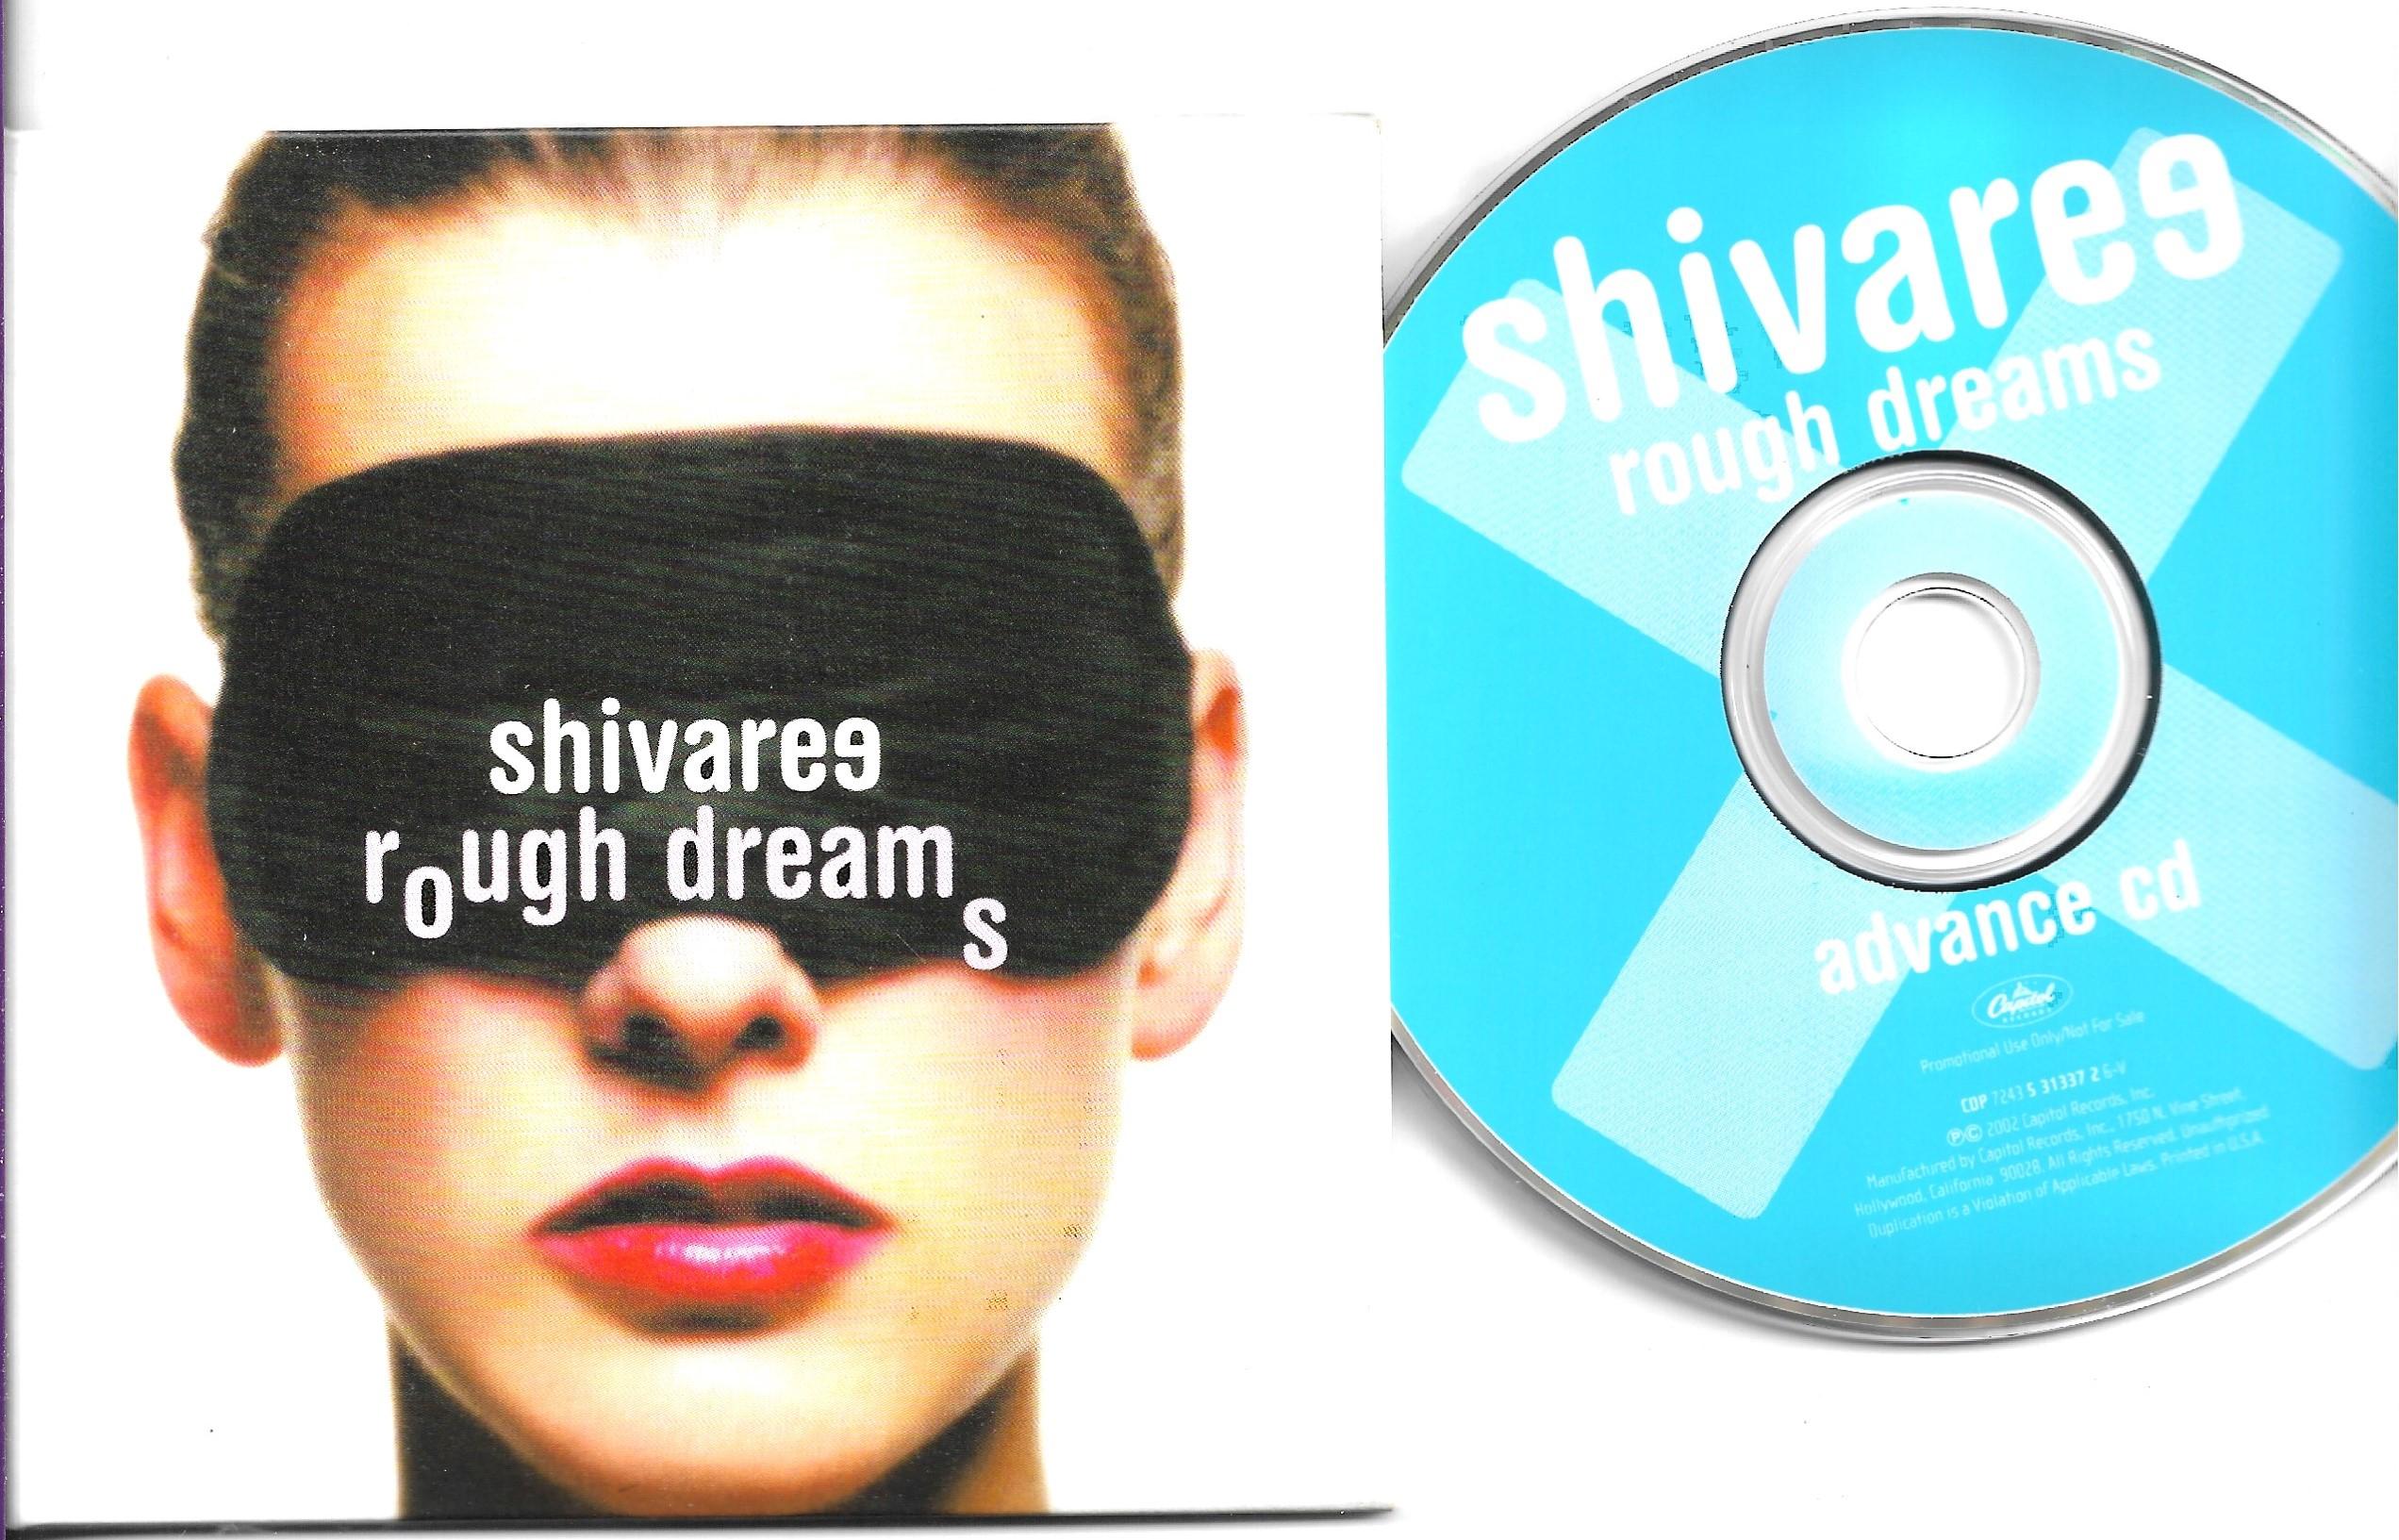 Shivaree Goodnight Moon Records Lps Vinyl And Cds